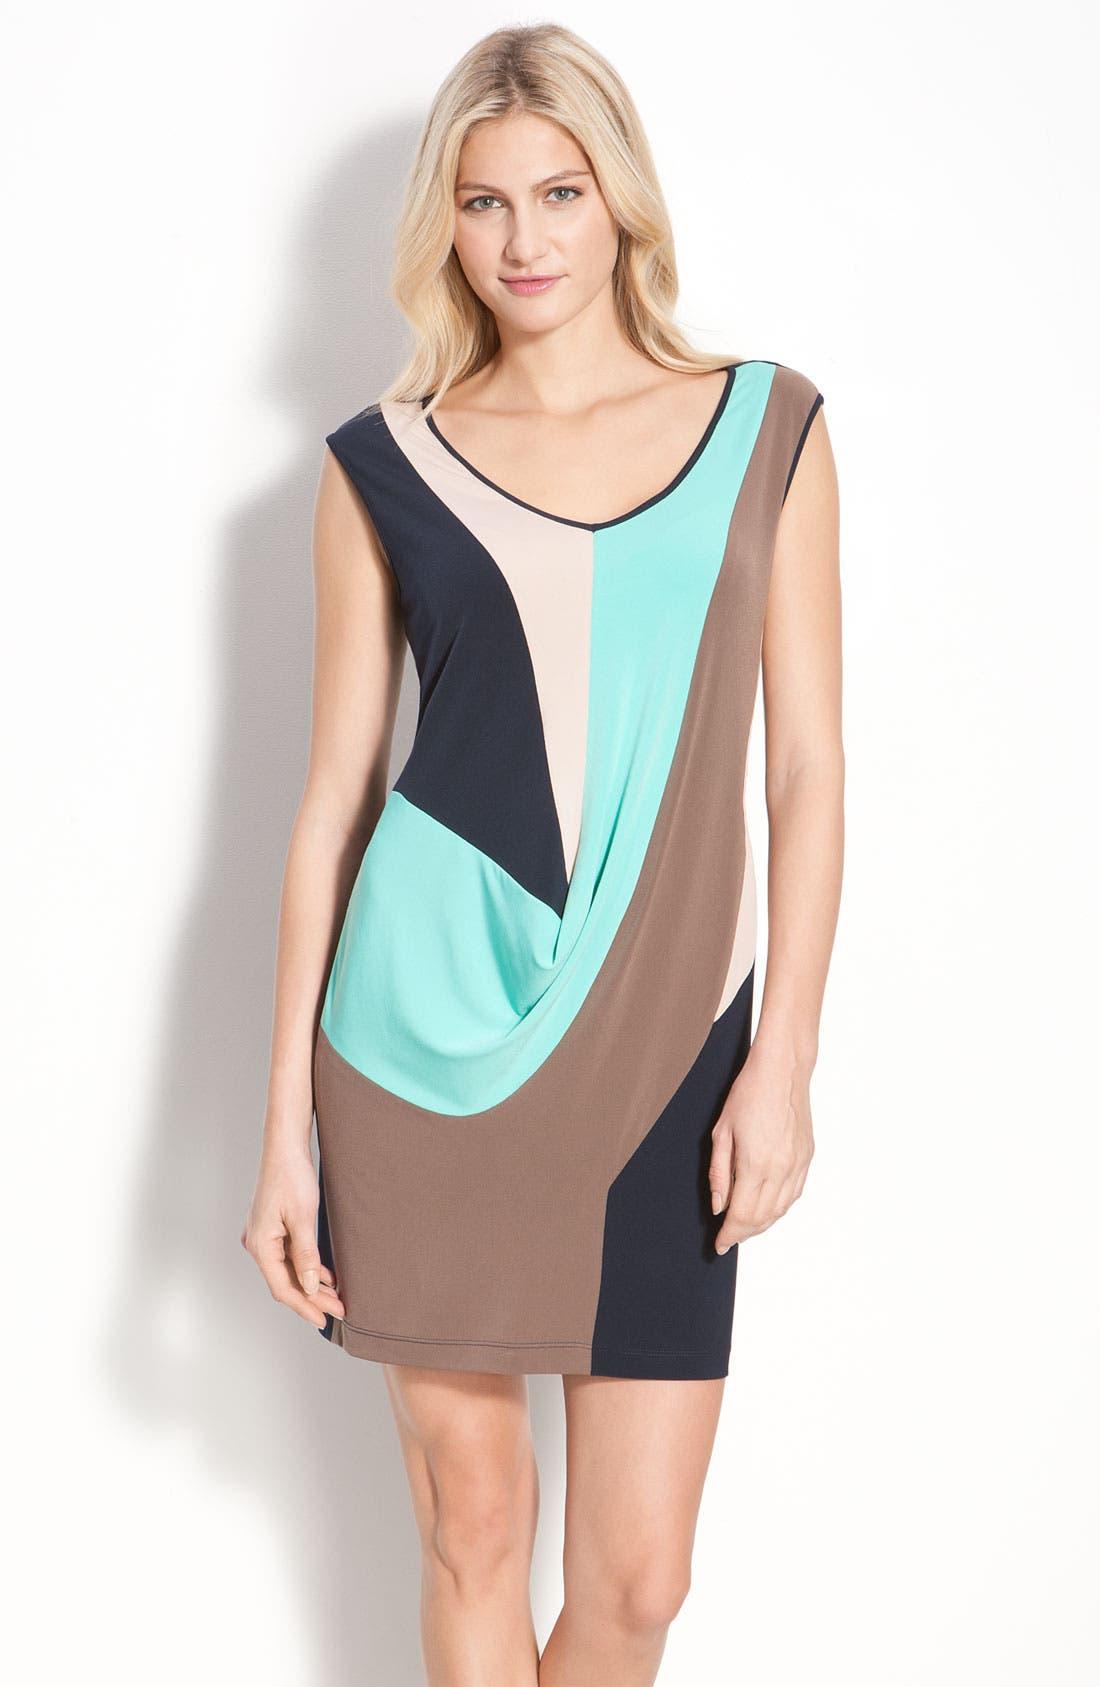 Alternate Image 1 Selected - Suzi Chin for Maggy Boutique Draped Colorblock Sheath Dress